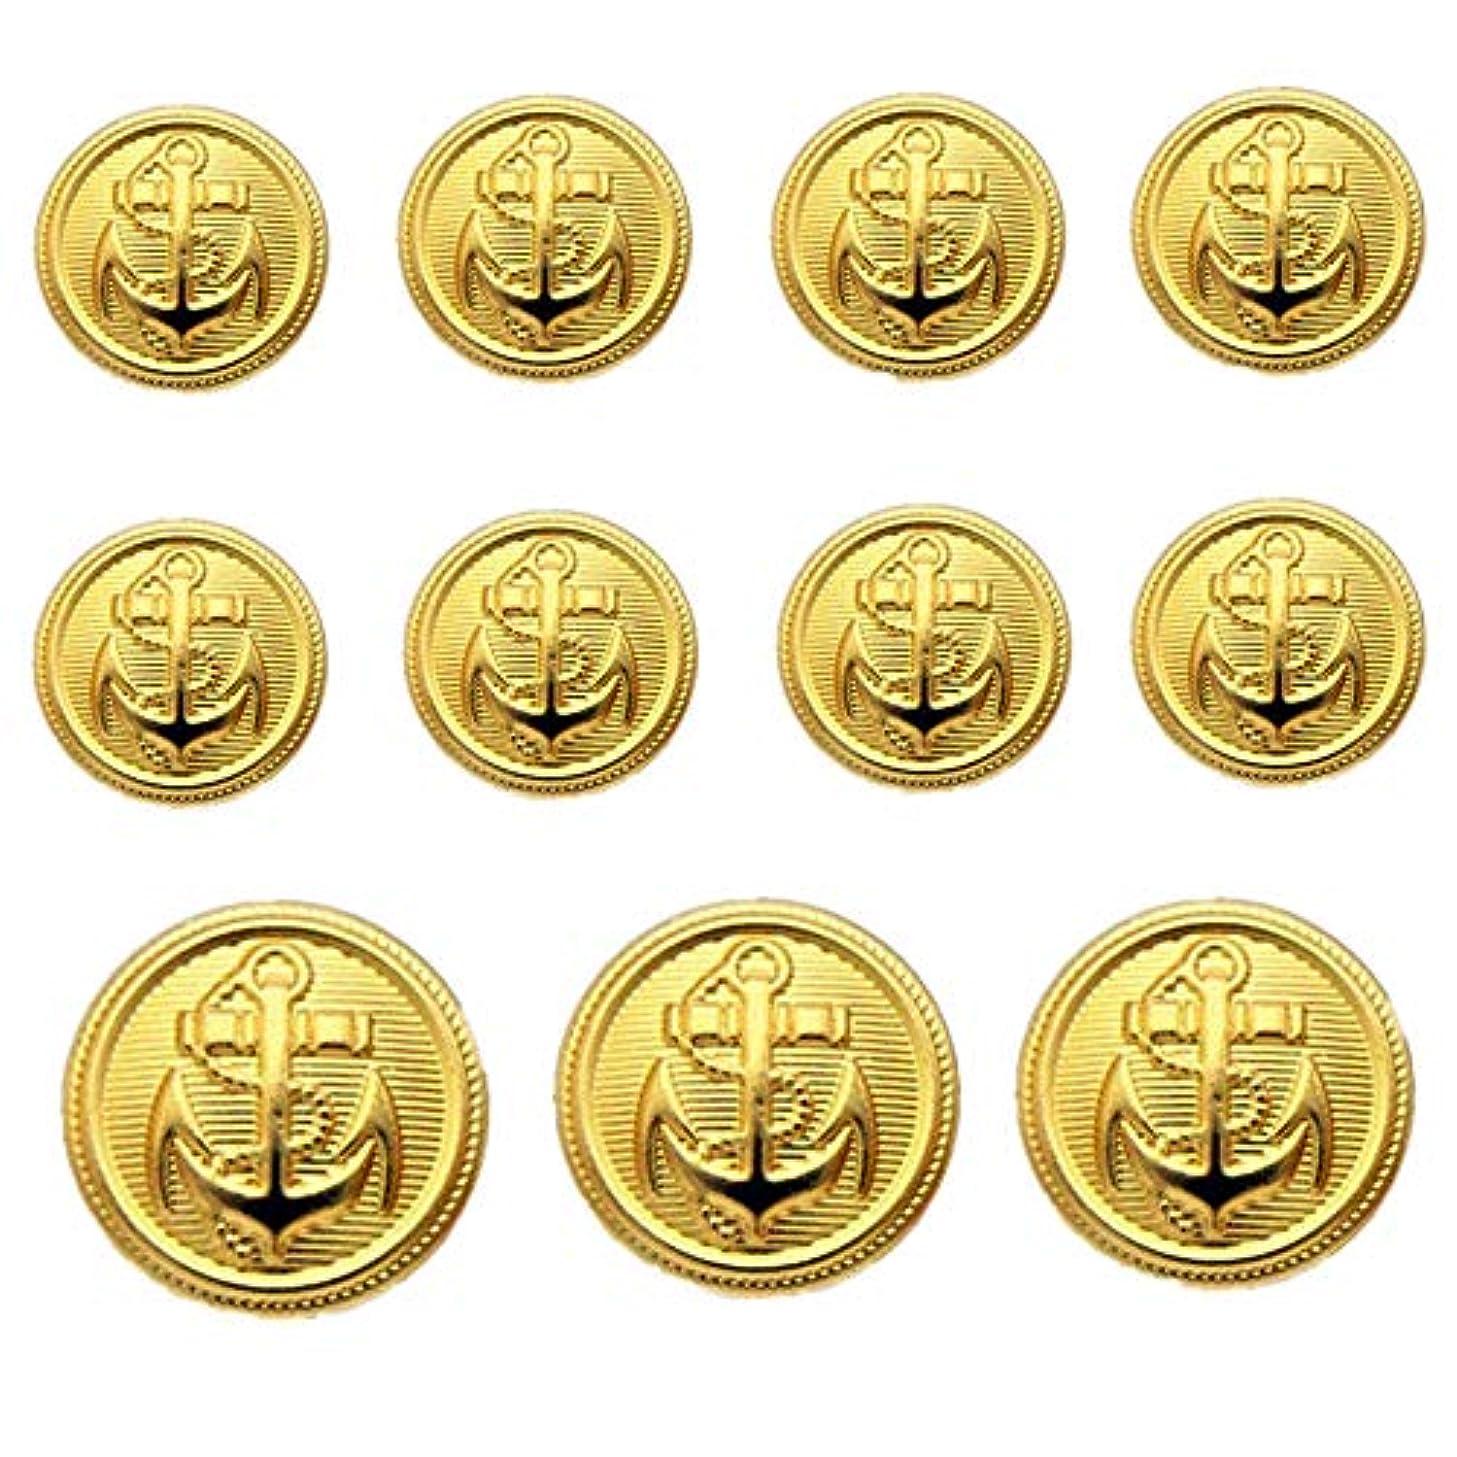 YCEE 11 Pieces Gold Metal Blazer Button Set - Naval Anchor Crest - for Blazer, Suits, Sport Coat, Uniform, Jacket